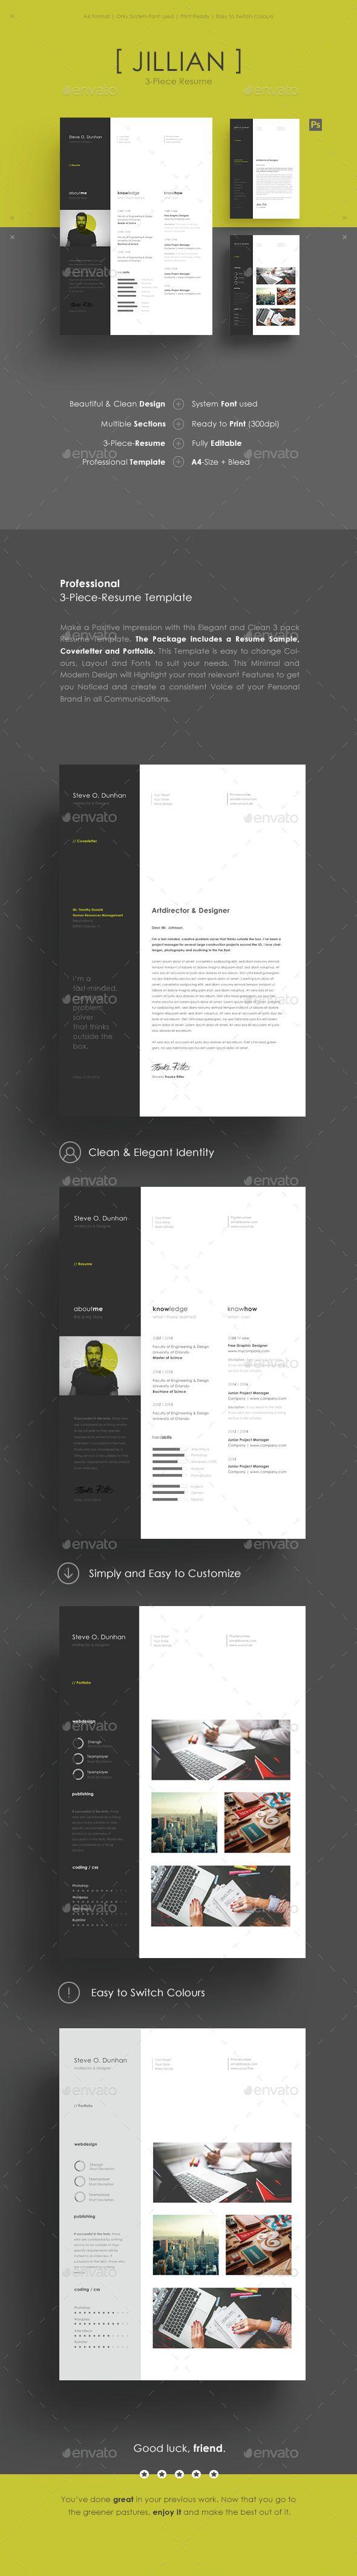 482 Best Resume Design Images On Pinterest Cv Template Resume